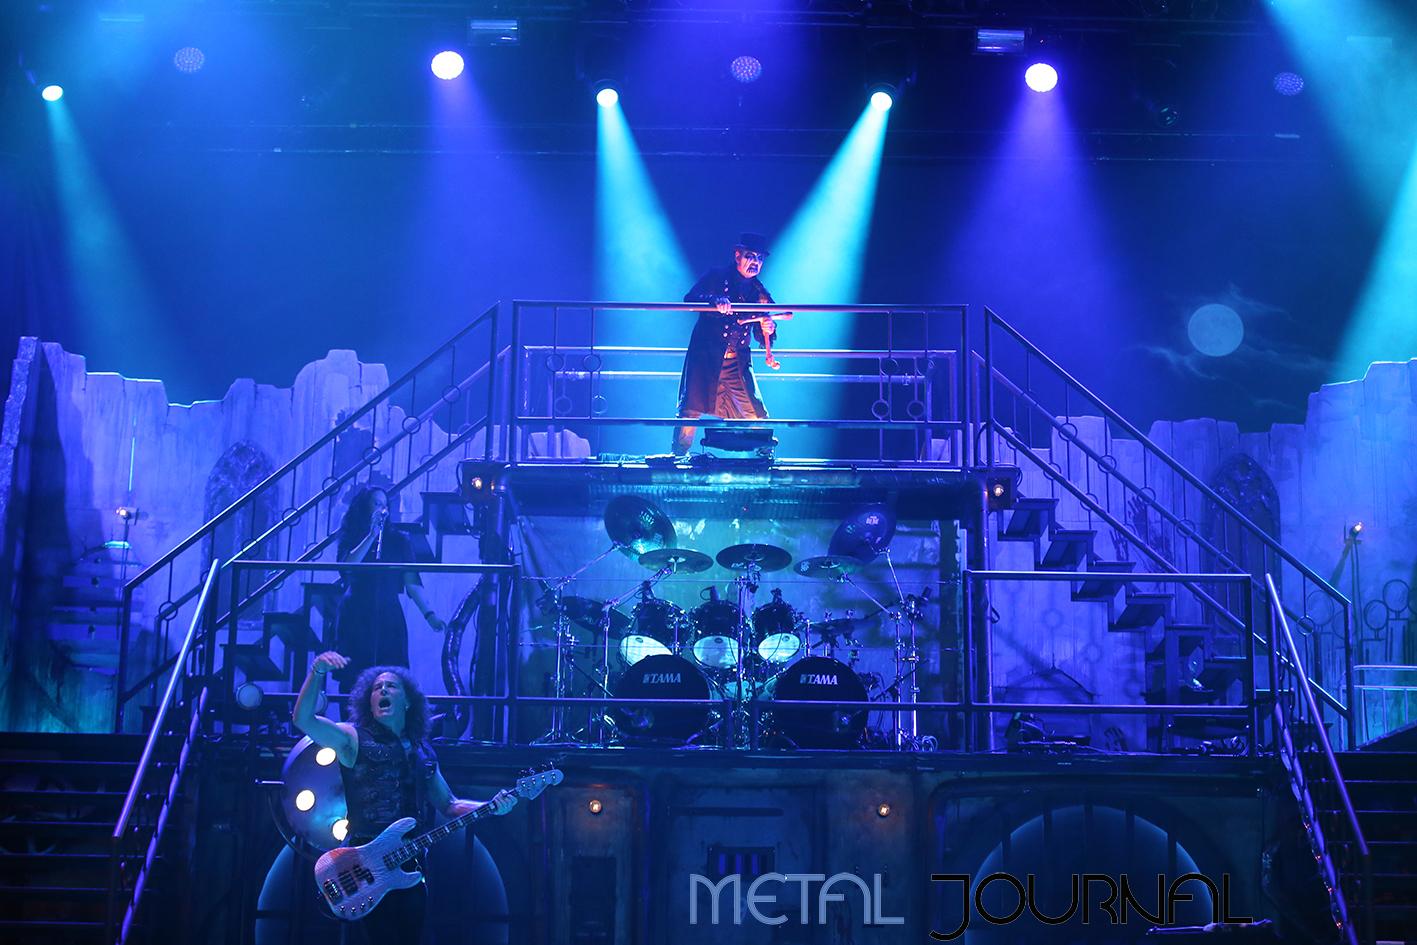 king diamond - metal journal rock fest barcelona 2019 pic 10